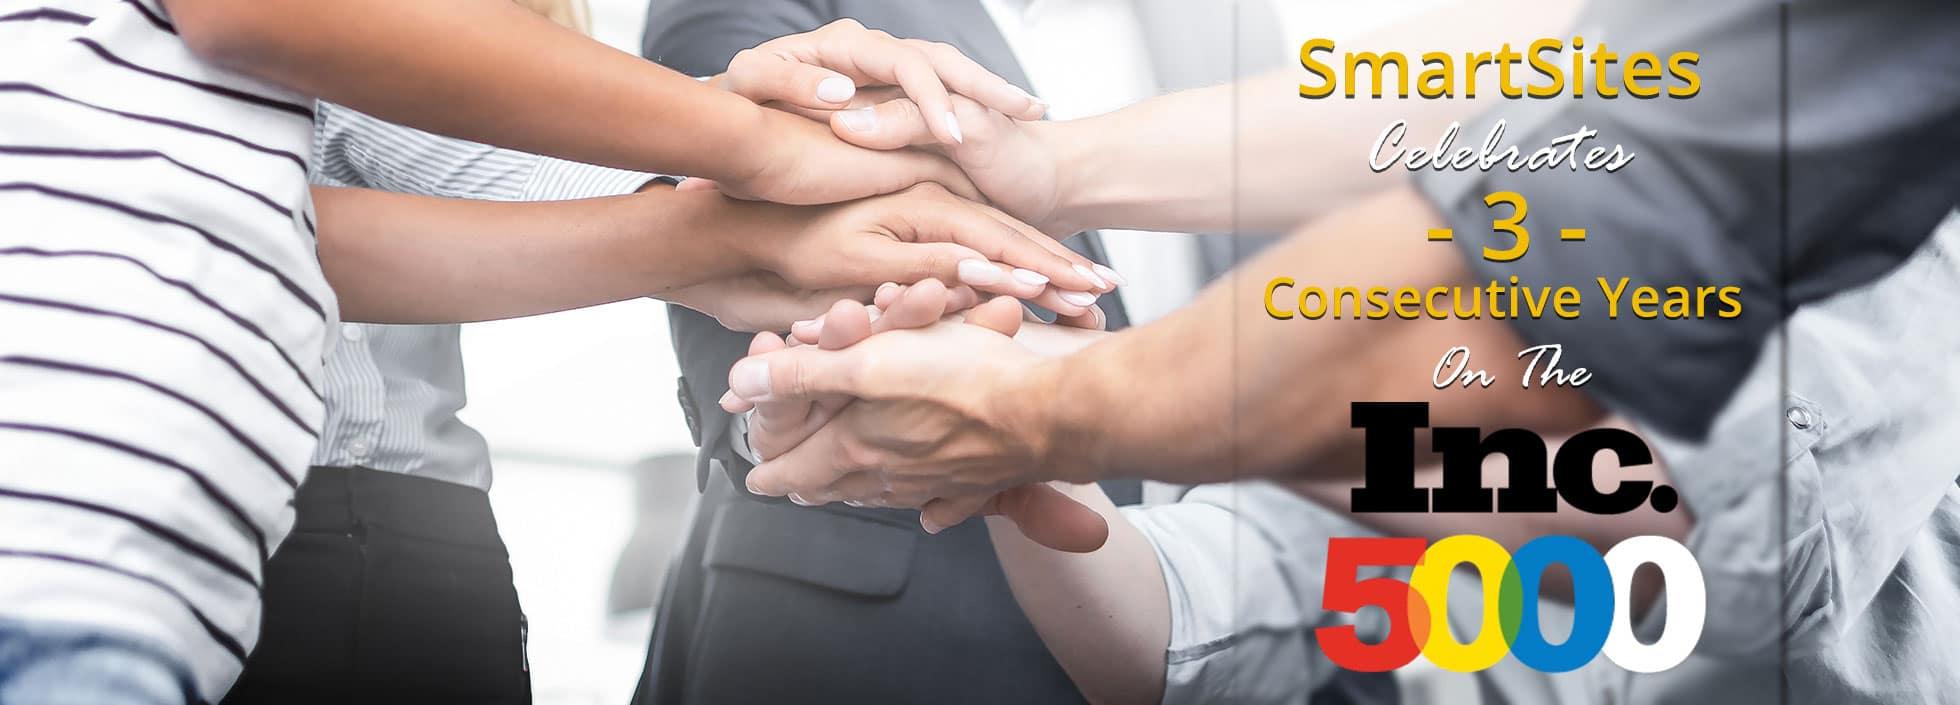 SmartSites Celebrates 3 Consecutive Years On The Inc. 5000 List